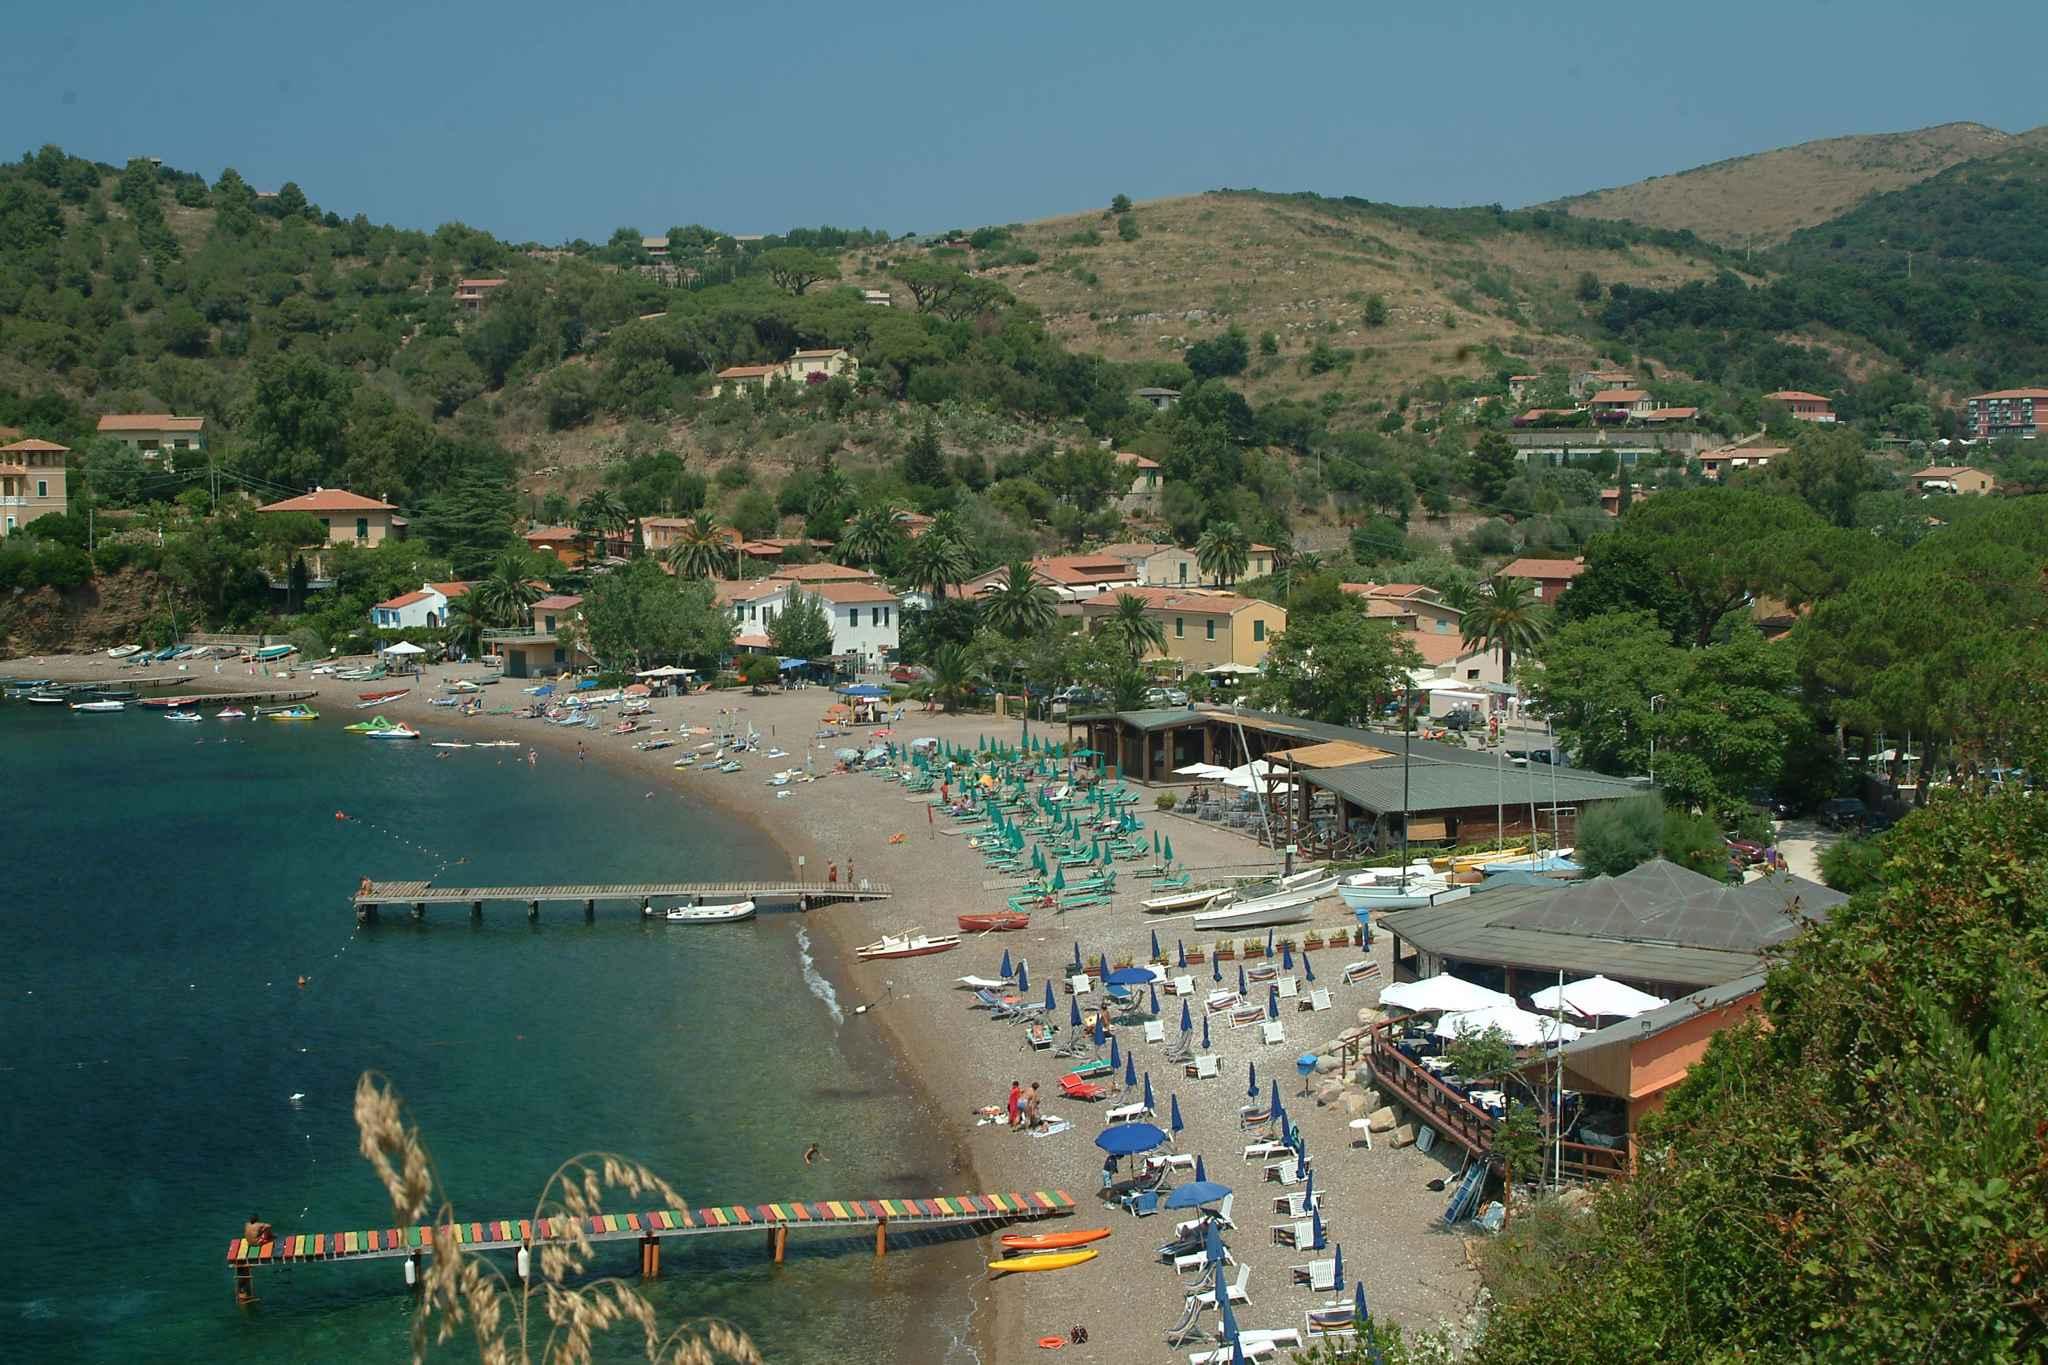 Ferienwohnung Residence Sant'Anna del Volterraio (403209), Rio Nell'Elba, Elba, Toskana, Italien, Bild 5